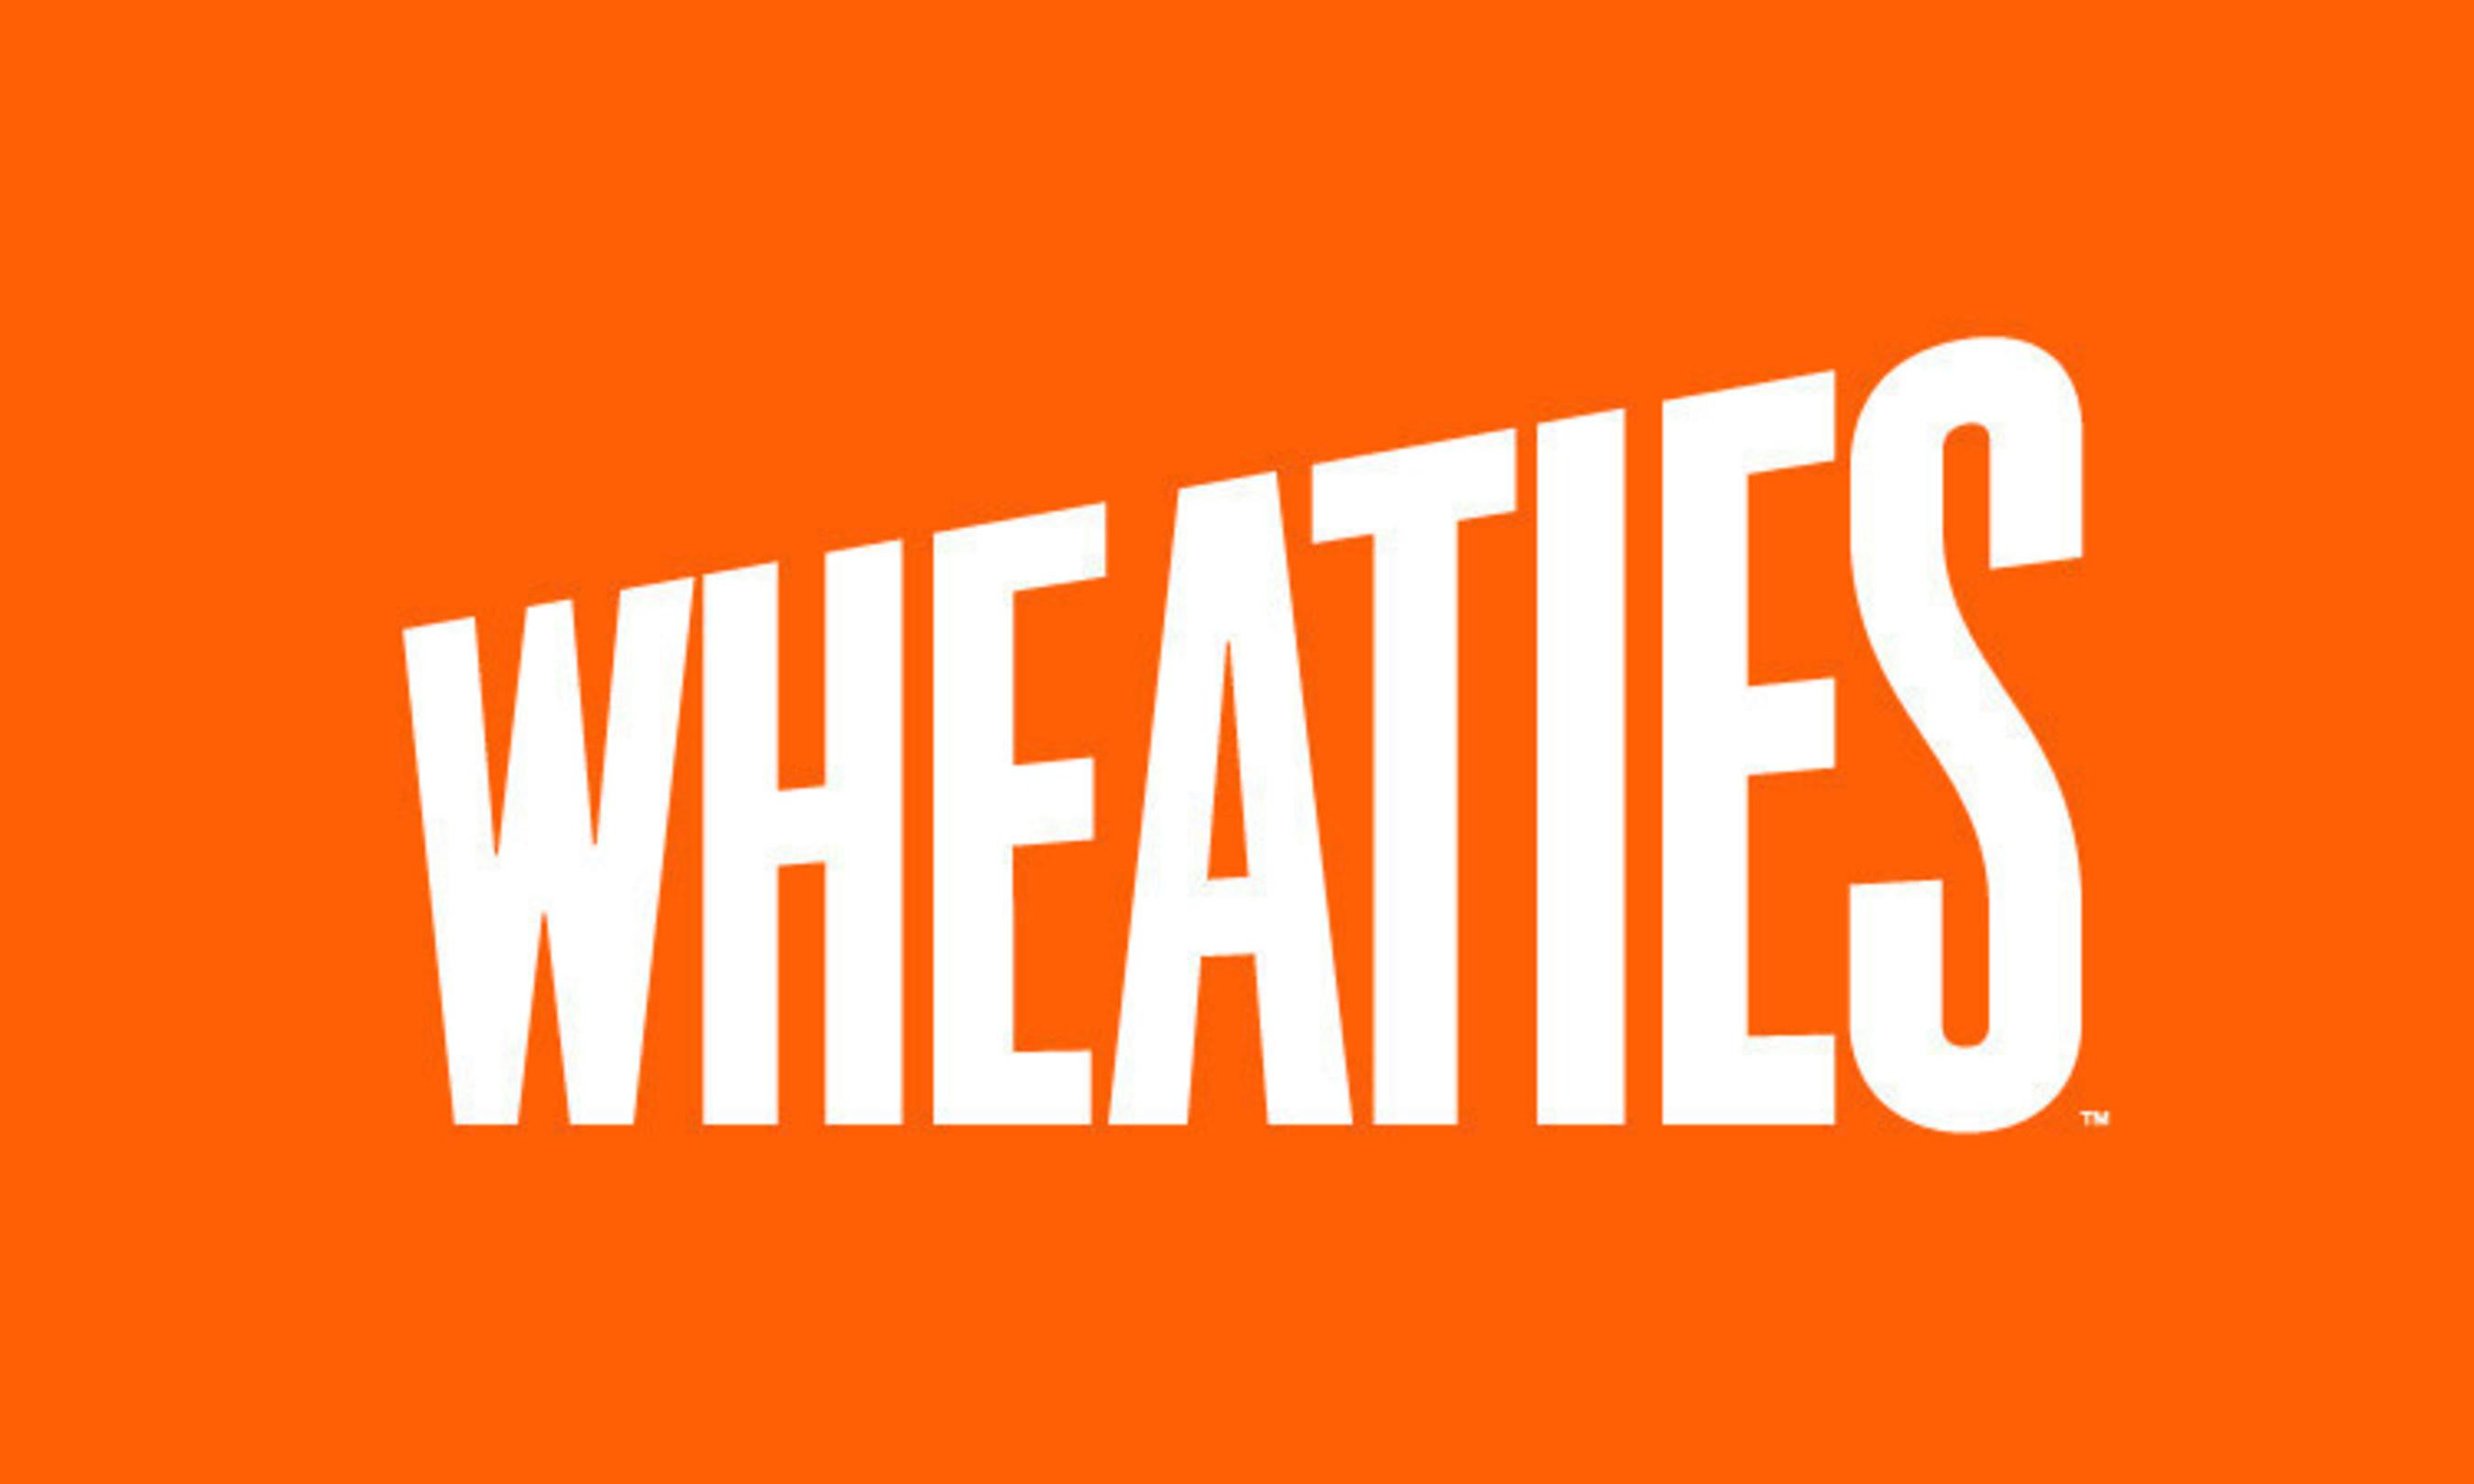 Wheaties logo (PRNewsFoto/Wheaties)